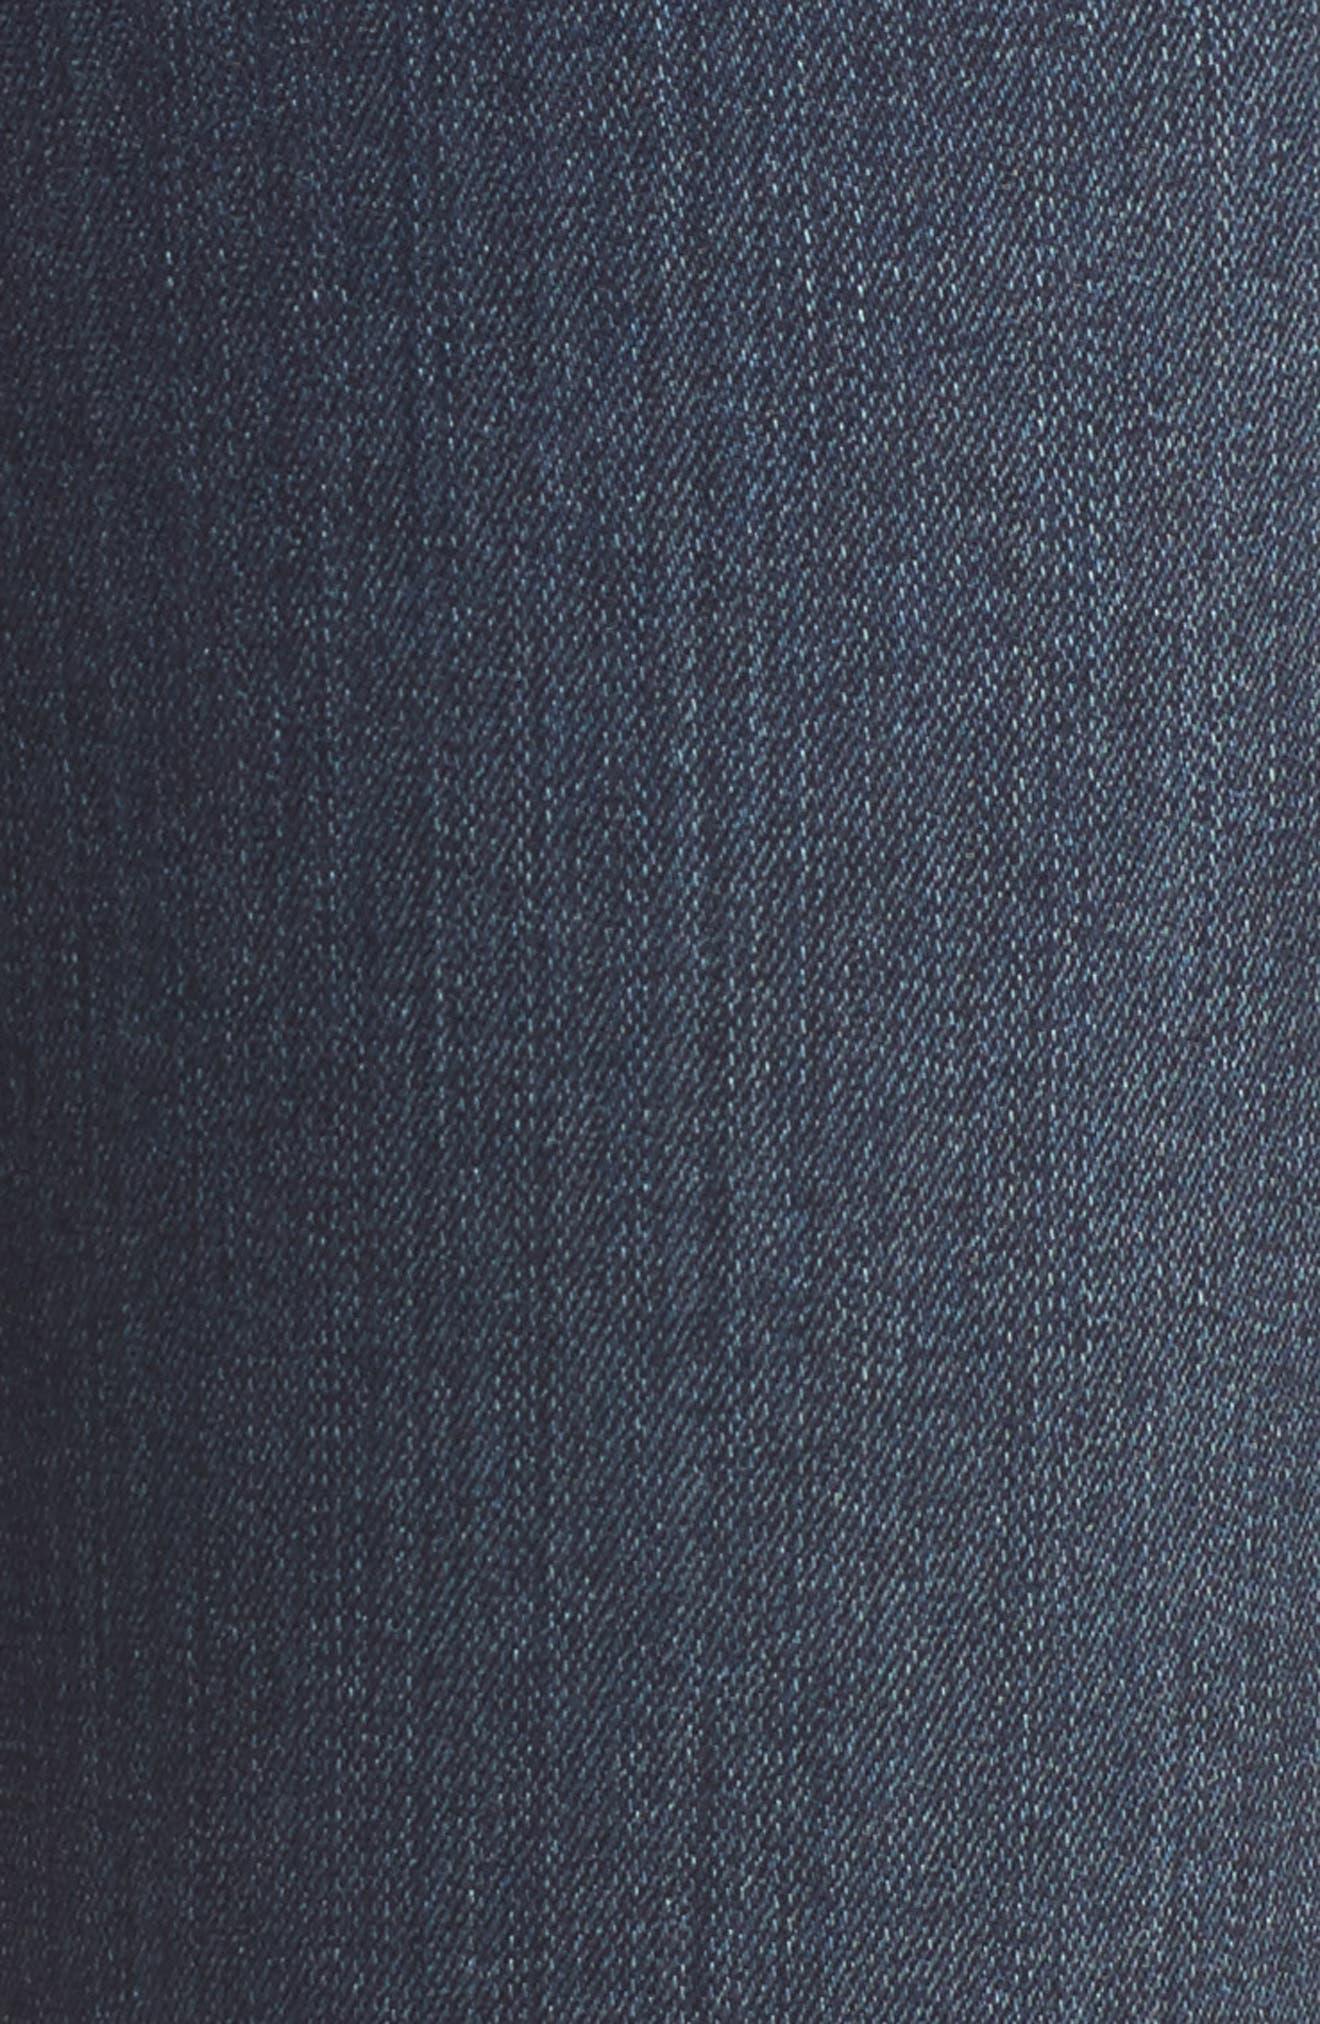 Transcend - Hoxton High Waist Ultra Skinny Jeans,                             Alternate thumbnail 7, color,                             Nottingham